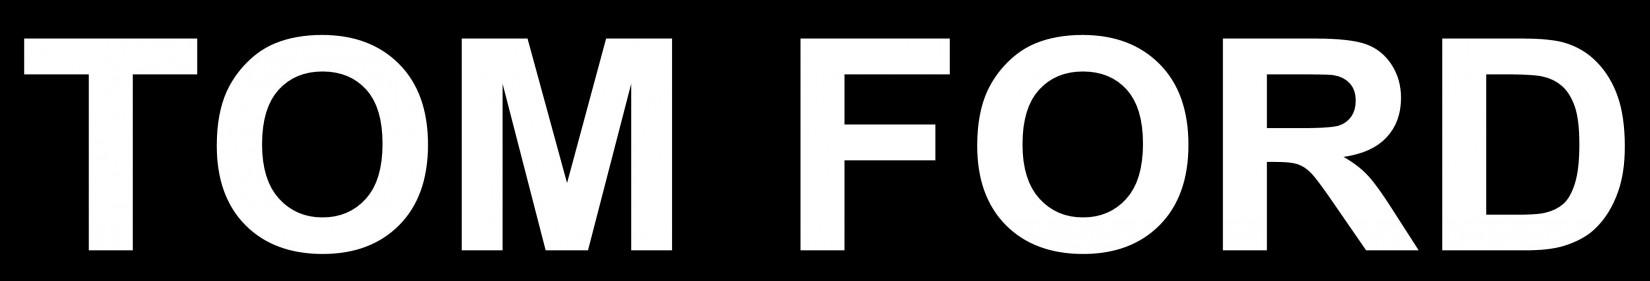 tom ford font forum dafont com rh dafont com ford logo font generator ford logo font type